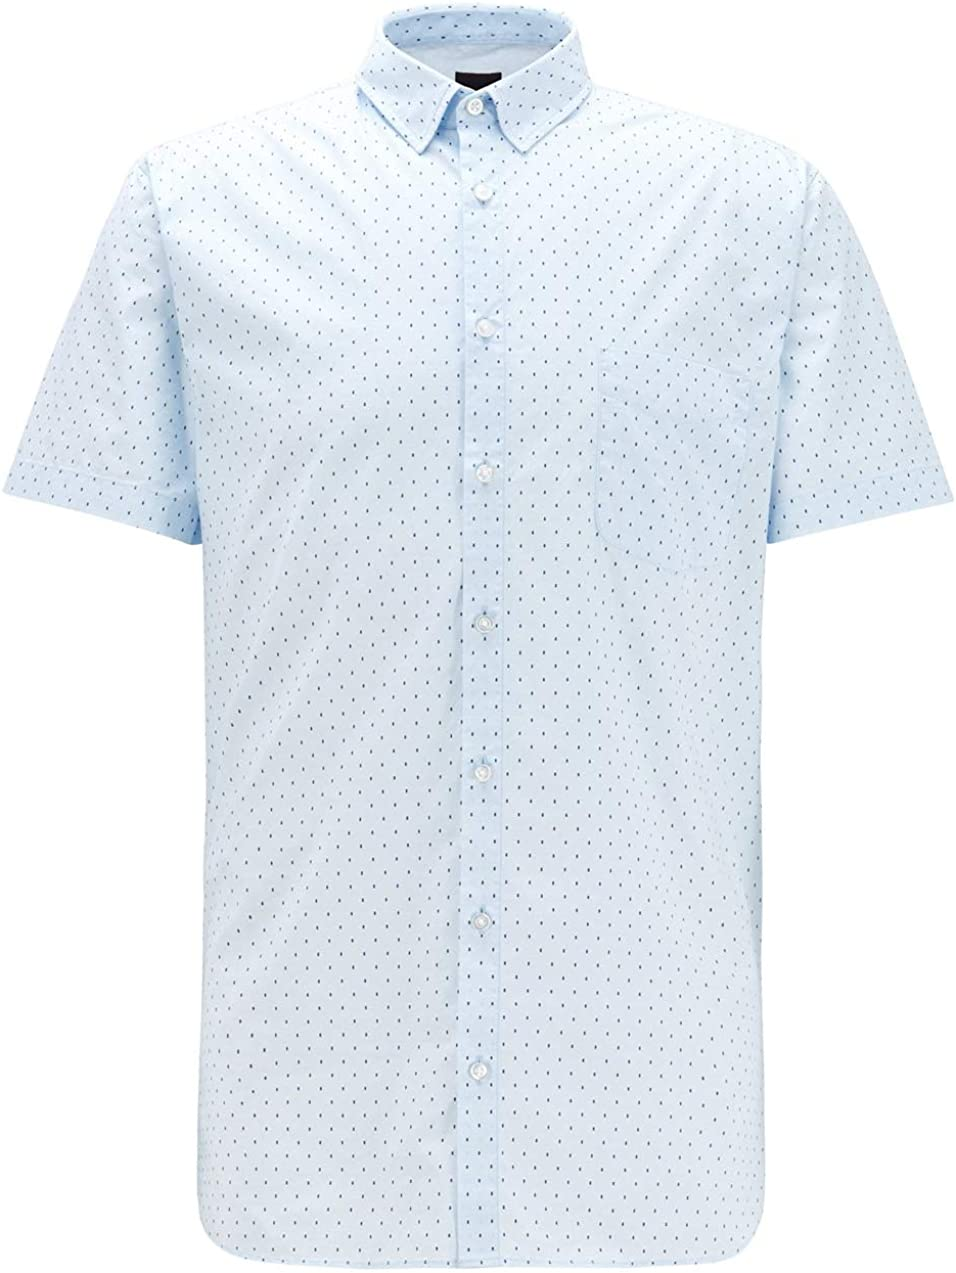 Hugo Boss Mens Casual Button Down Shirt